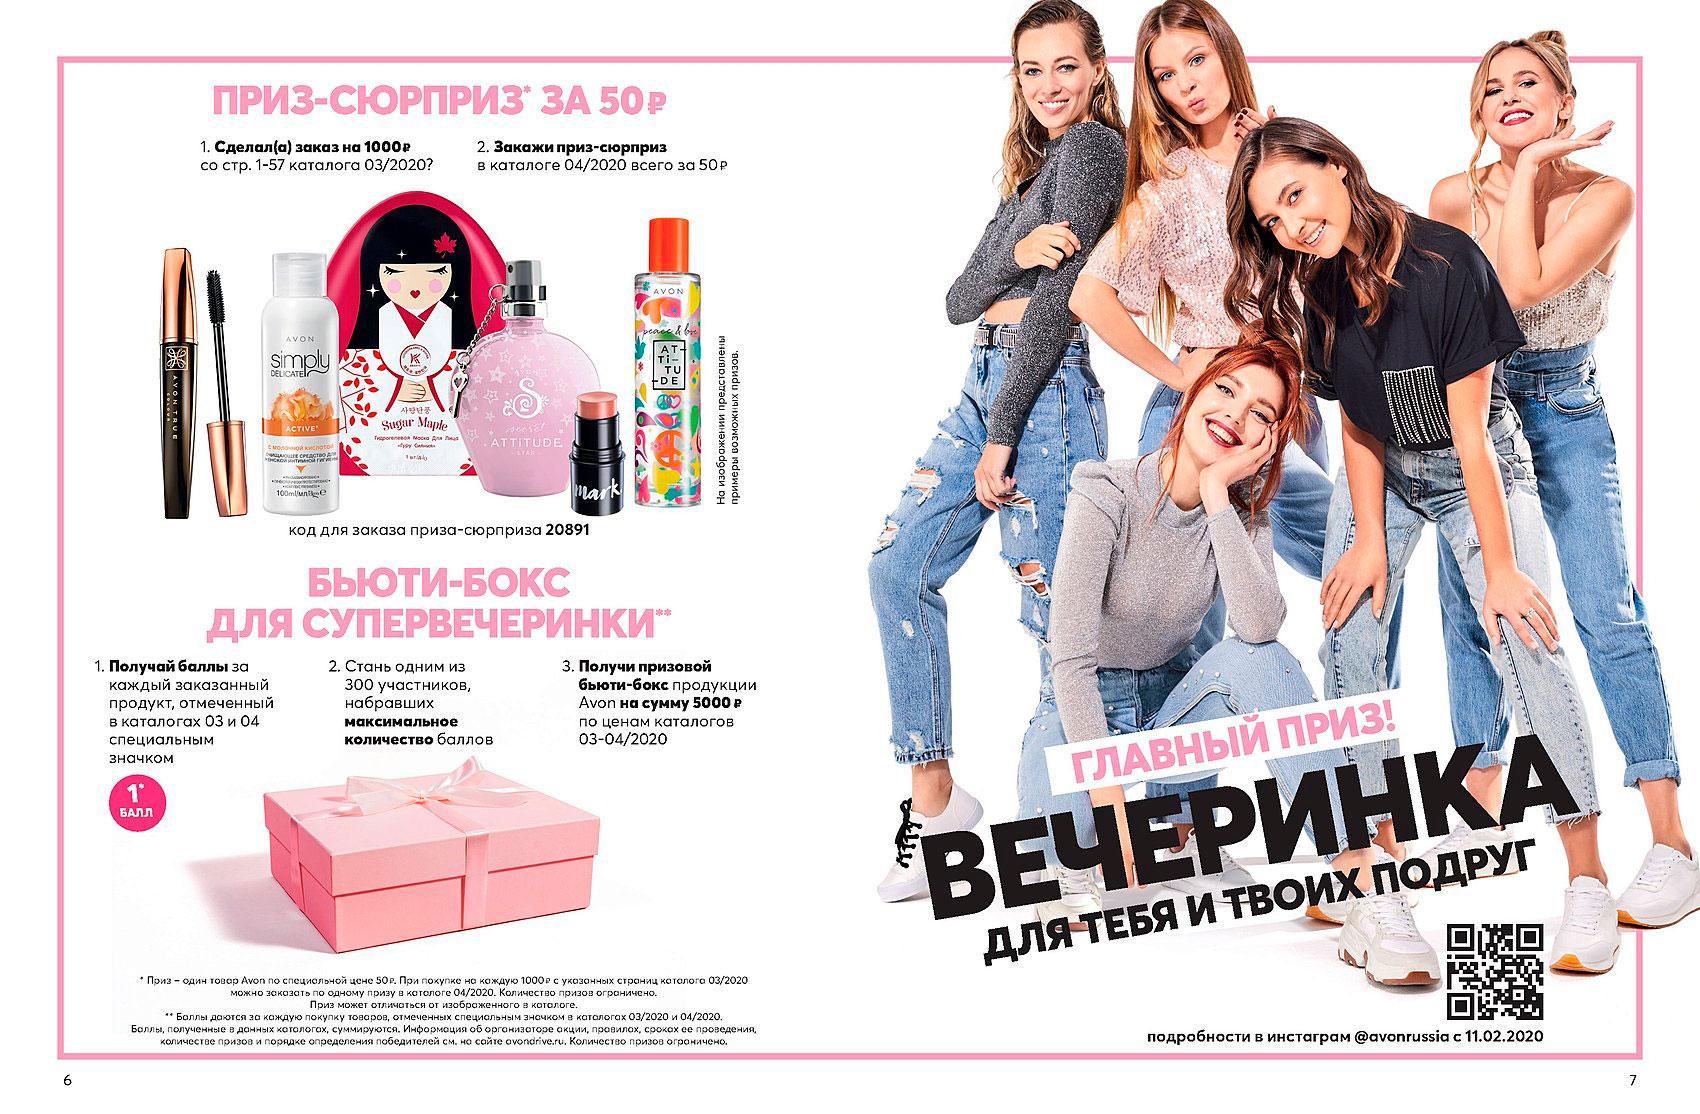 Ейвон акции essence косметика купить в томске